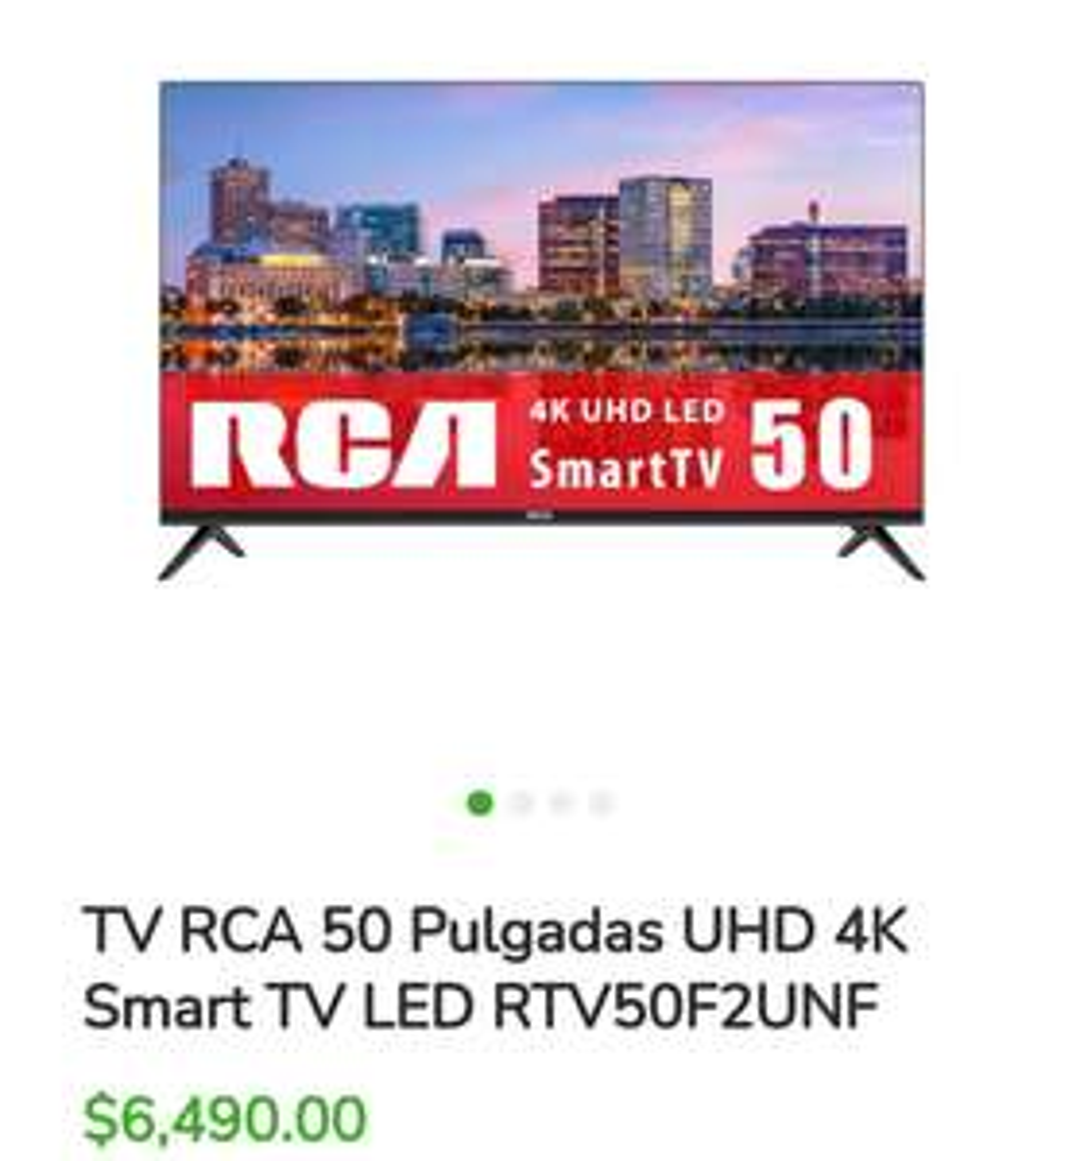 Bodega Aurrera: TV RCA 50 Pulgadas UHD 4K Smart TV LED RTV50F2UNF